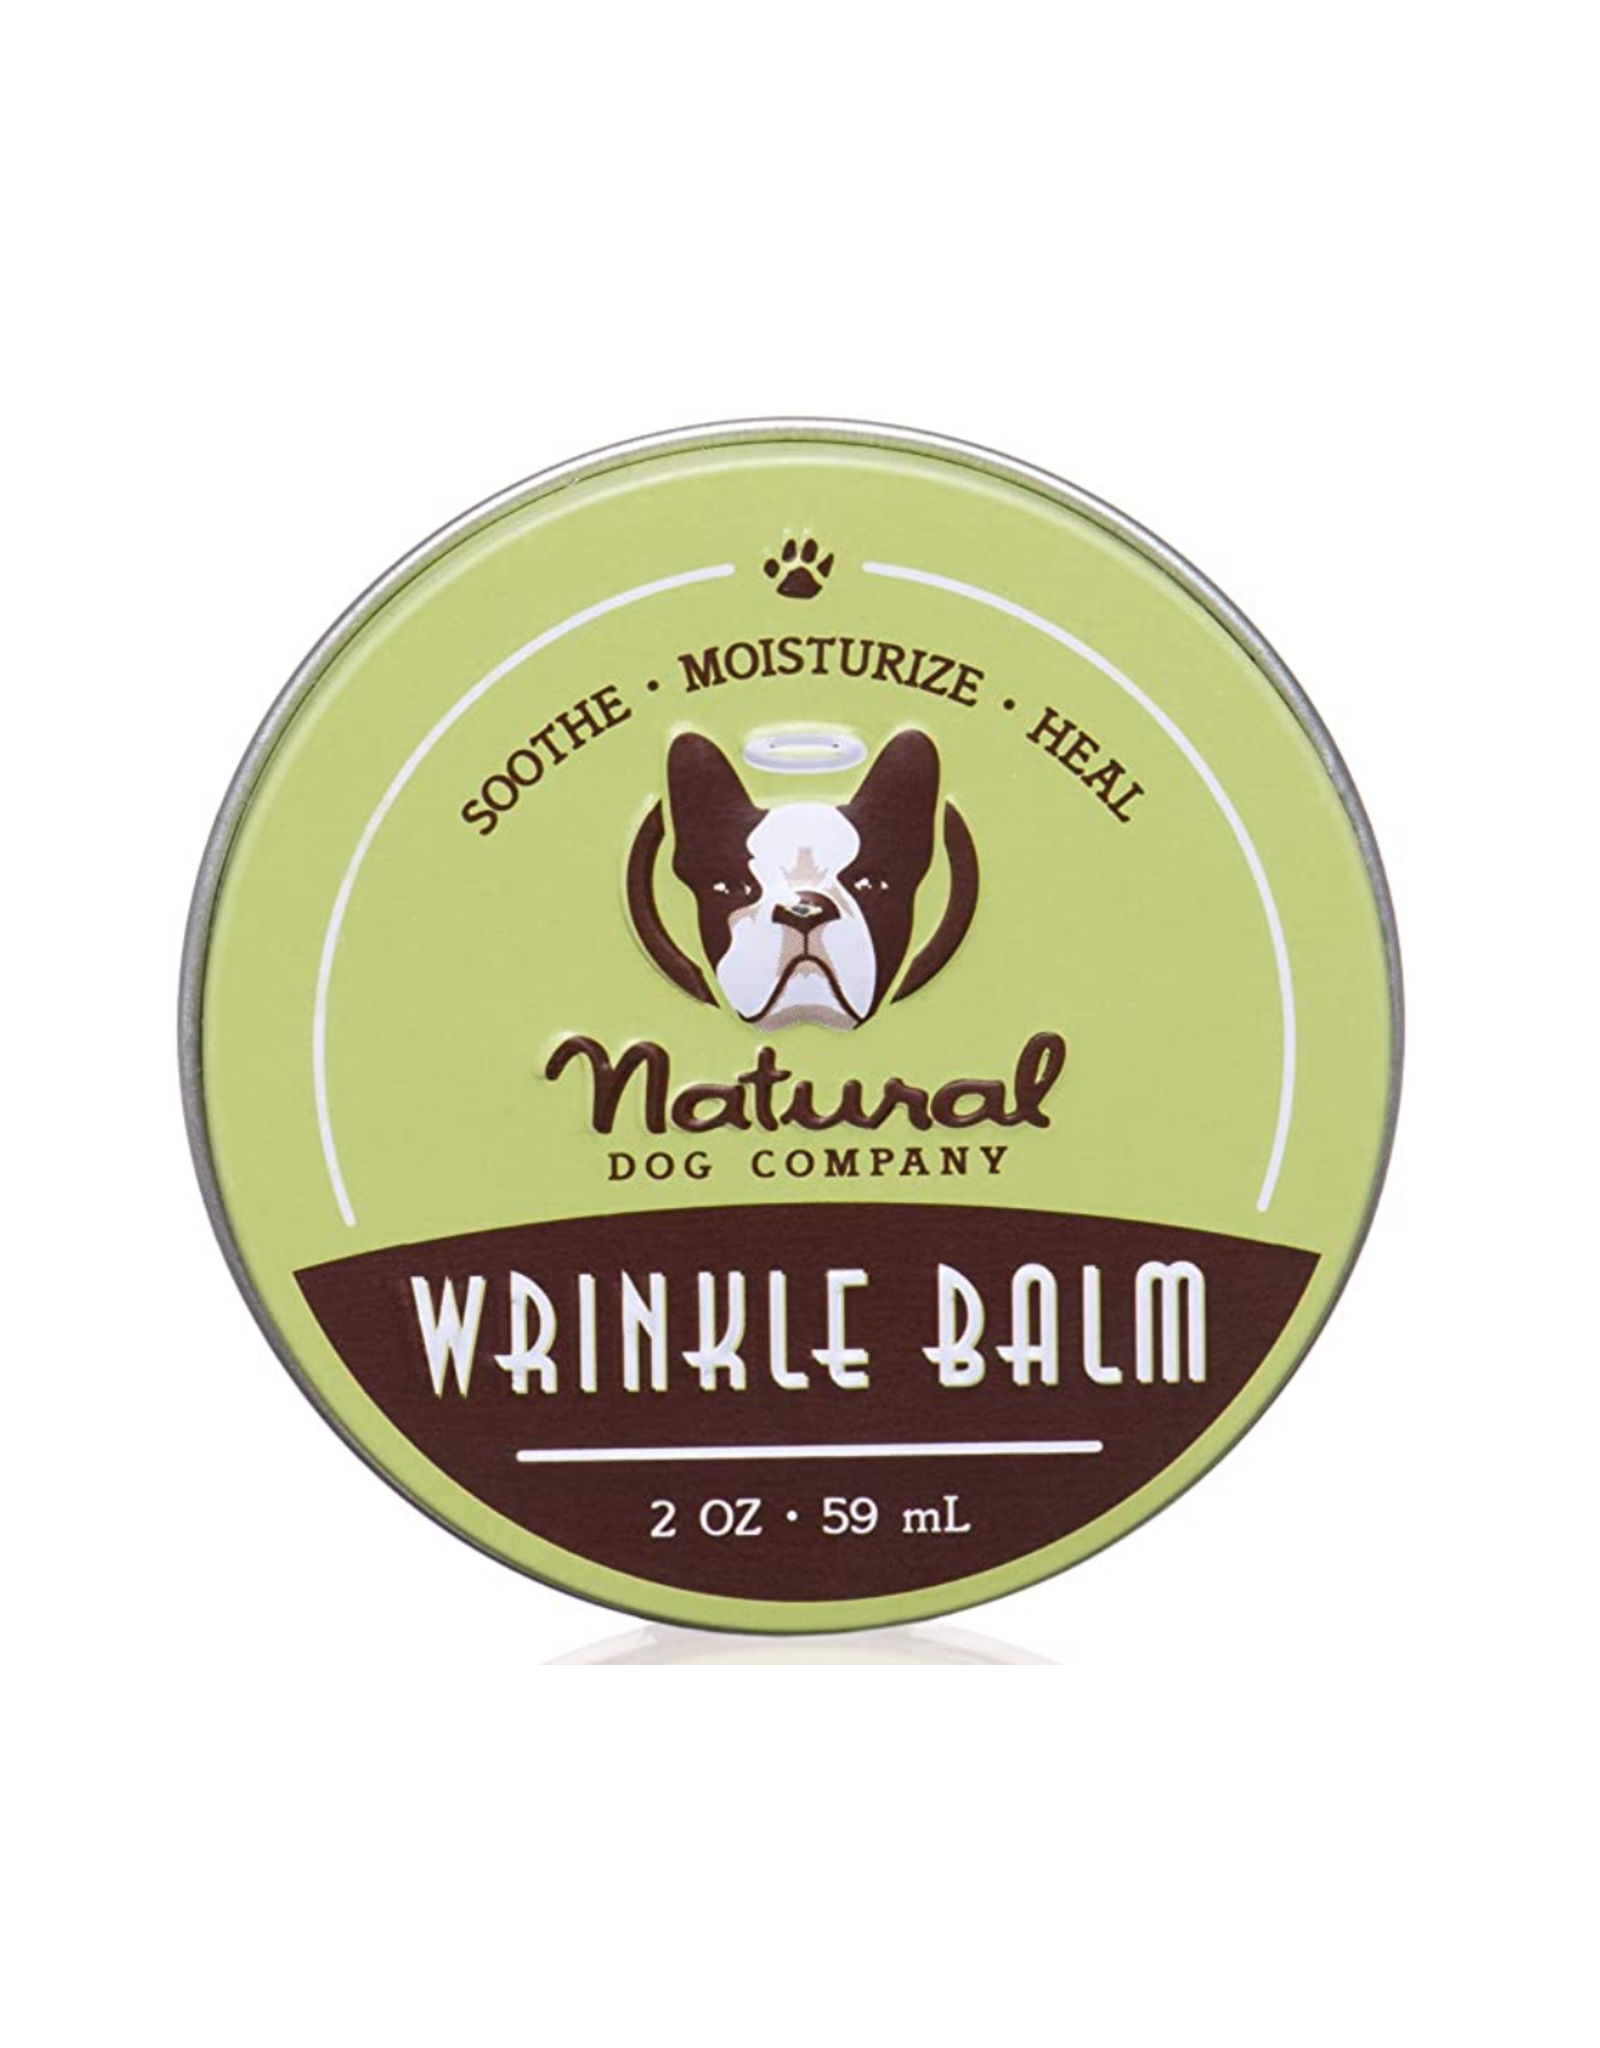 Natural Dog Company Natural Dog Company -  Wrinkle Balm Tin 2oz